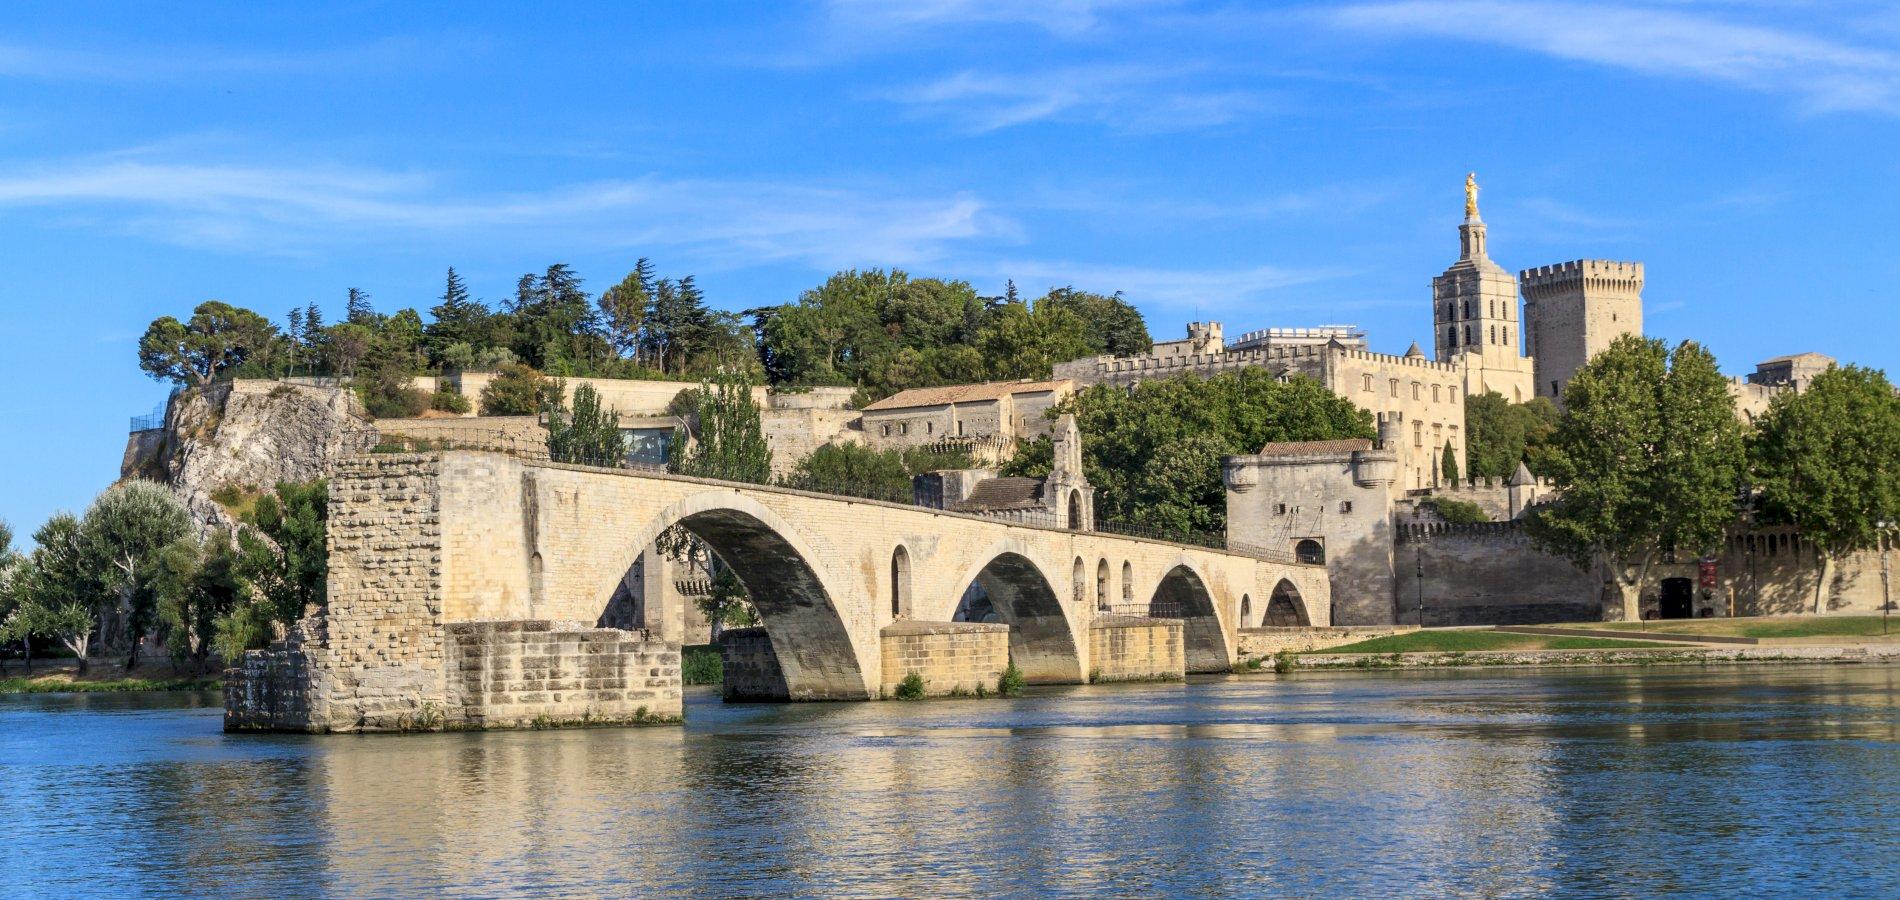 Ophorus Tours - From Lyon to Avignon Private Transfer